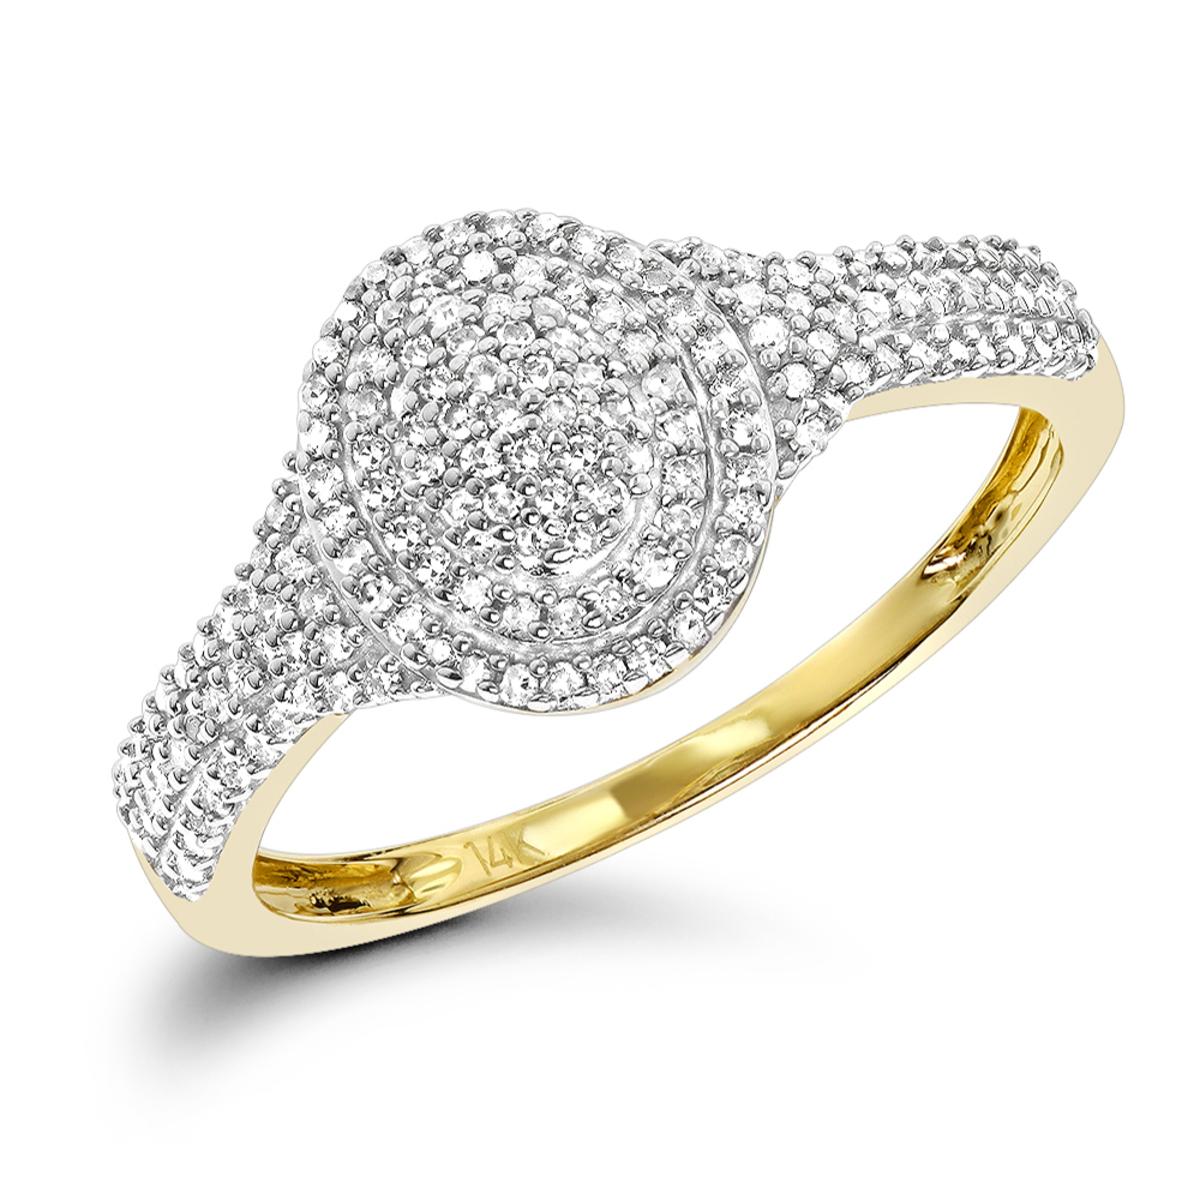 Diamond Oval Shaped Ring 14K 0.33ct